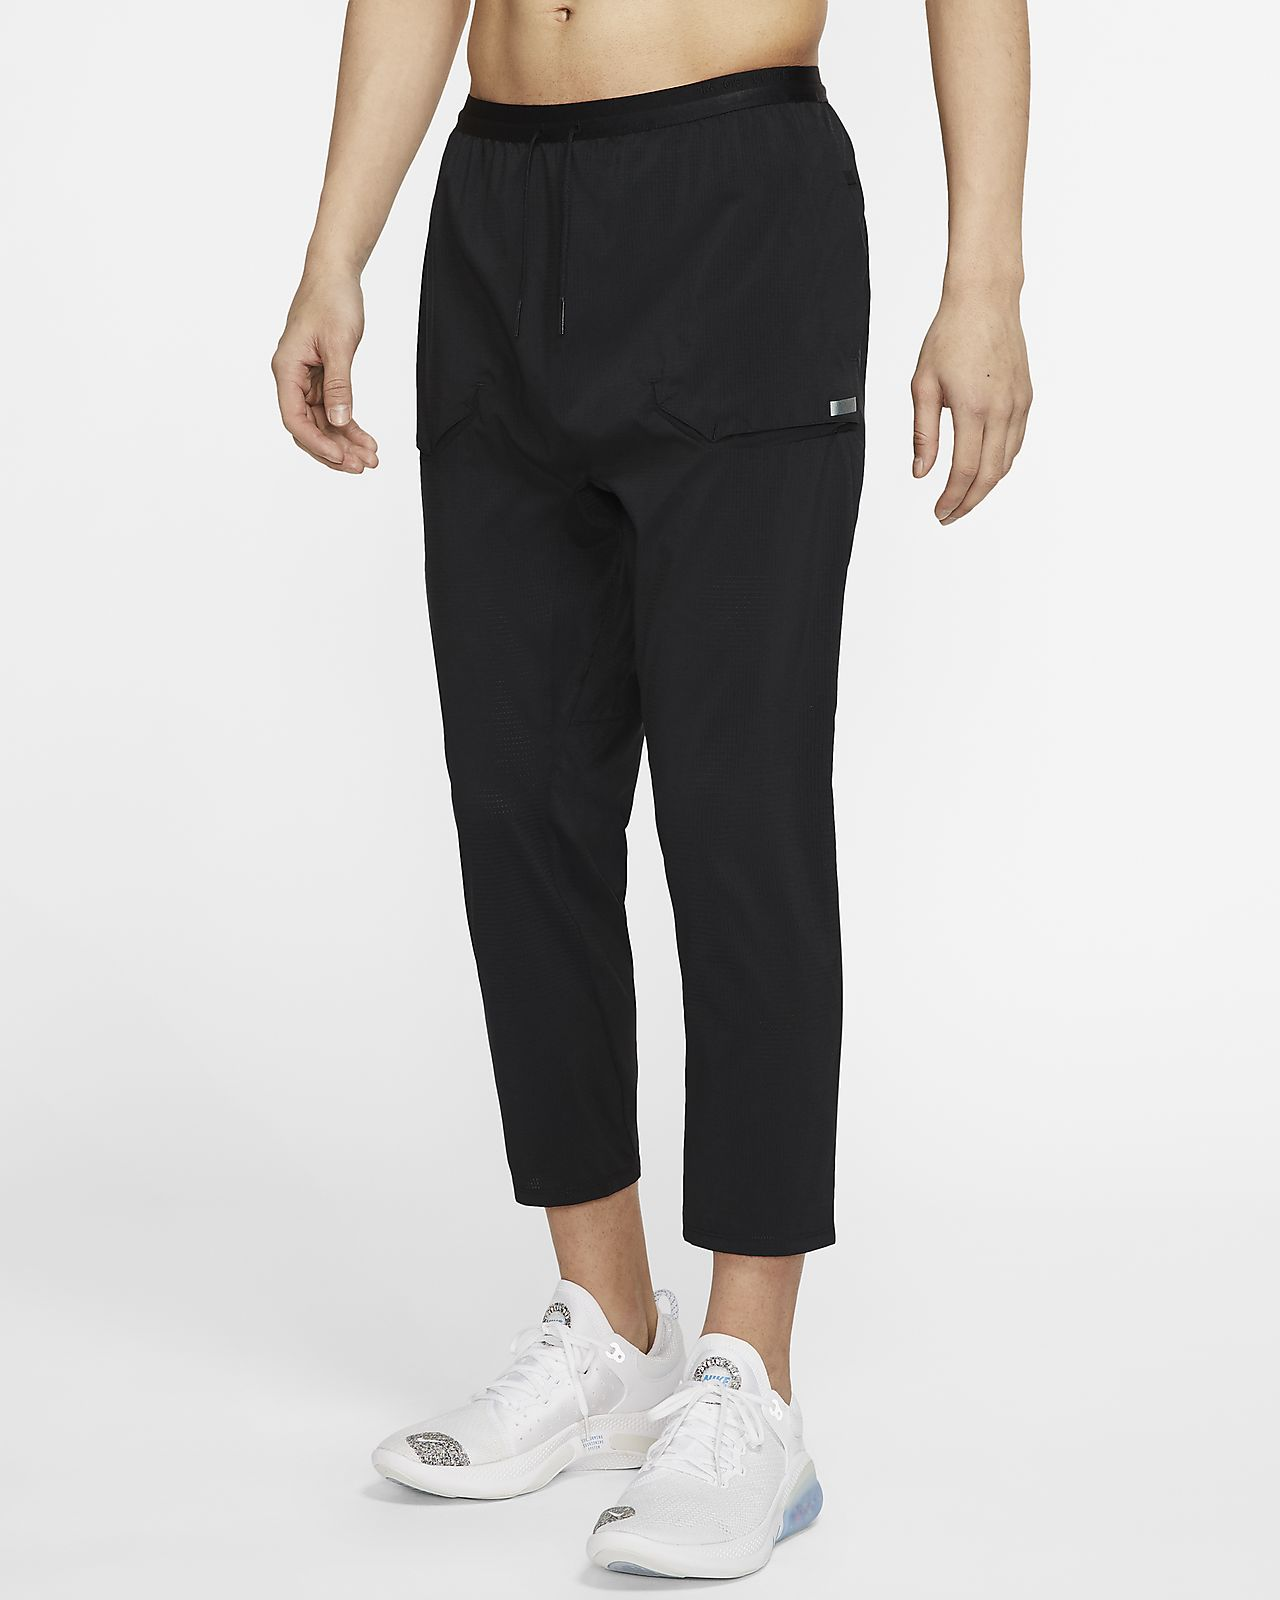 Nike Tech Pack Men's 7/8 Running Pants